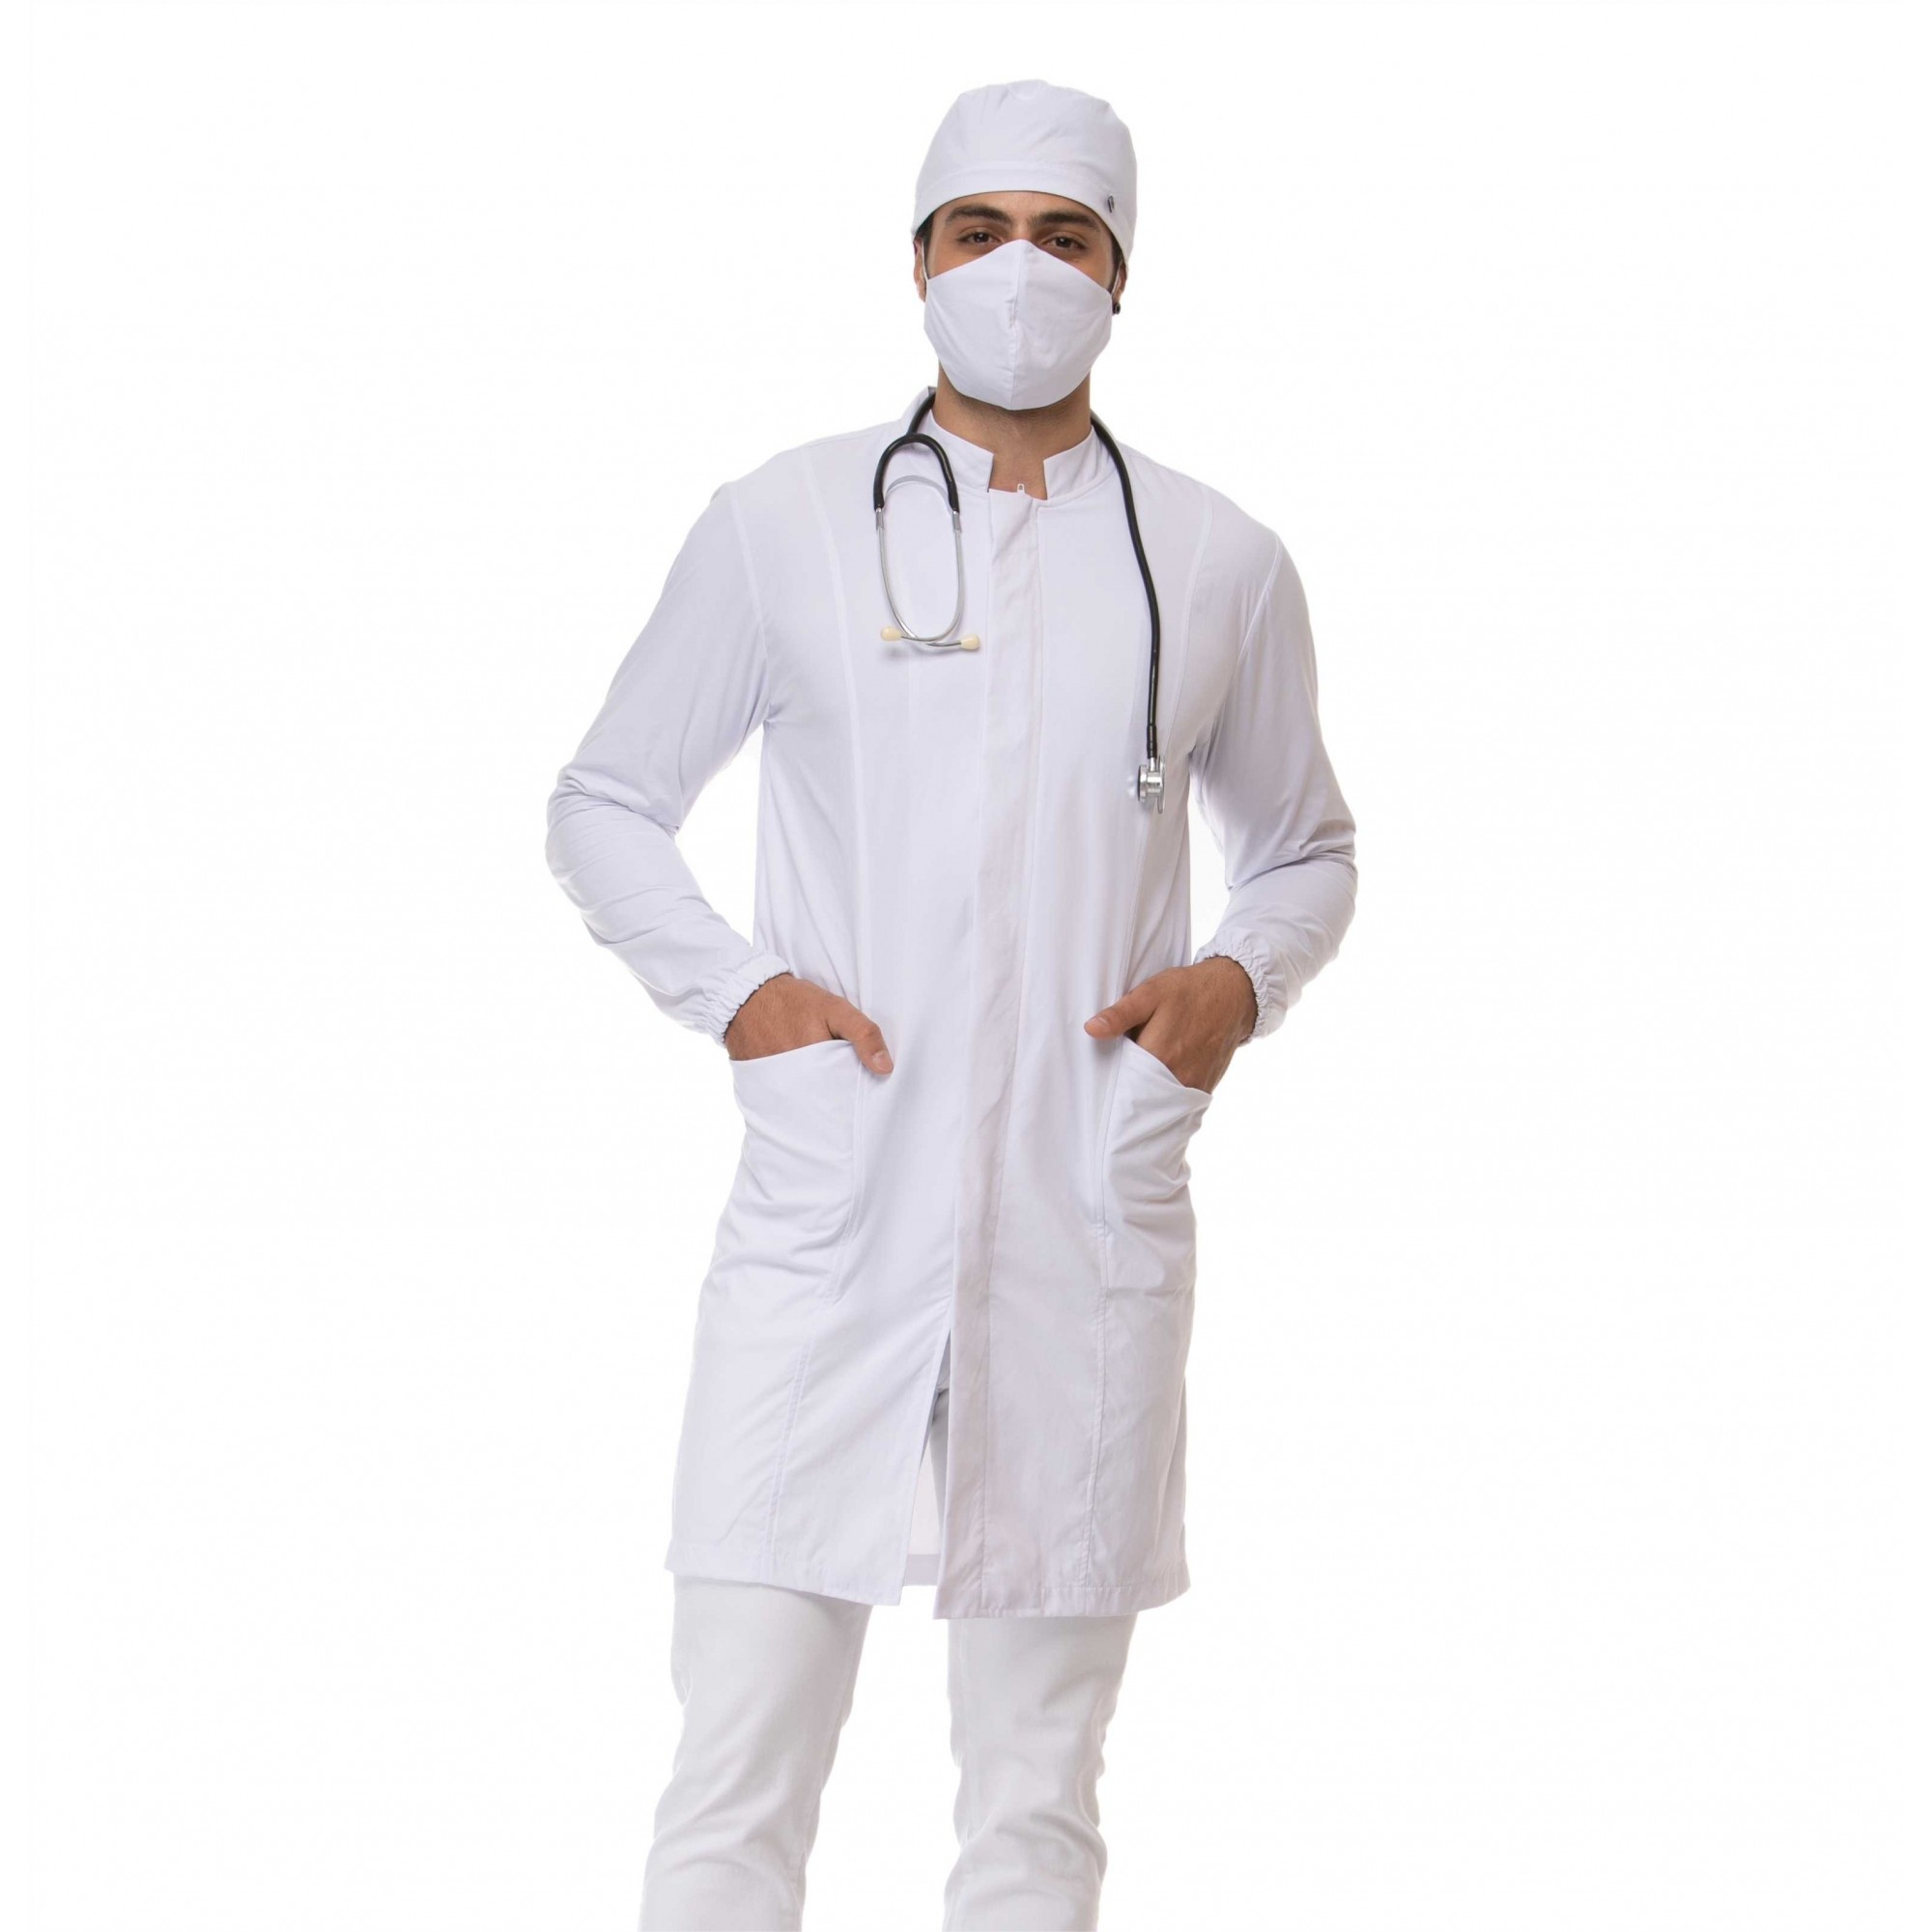 Jaleco Protect Antiviral Masculino